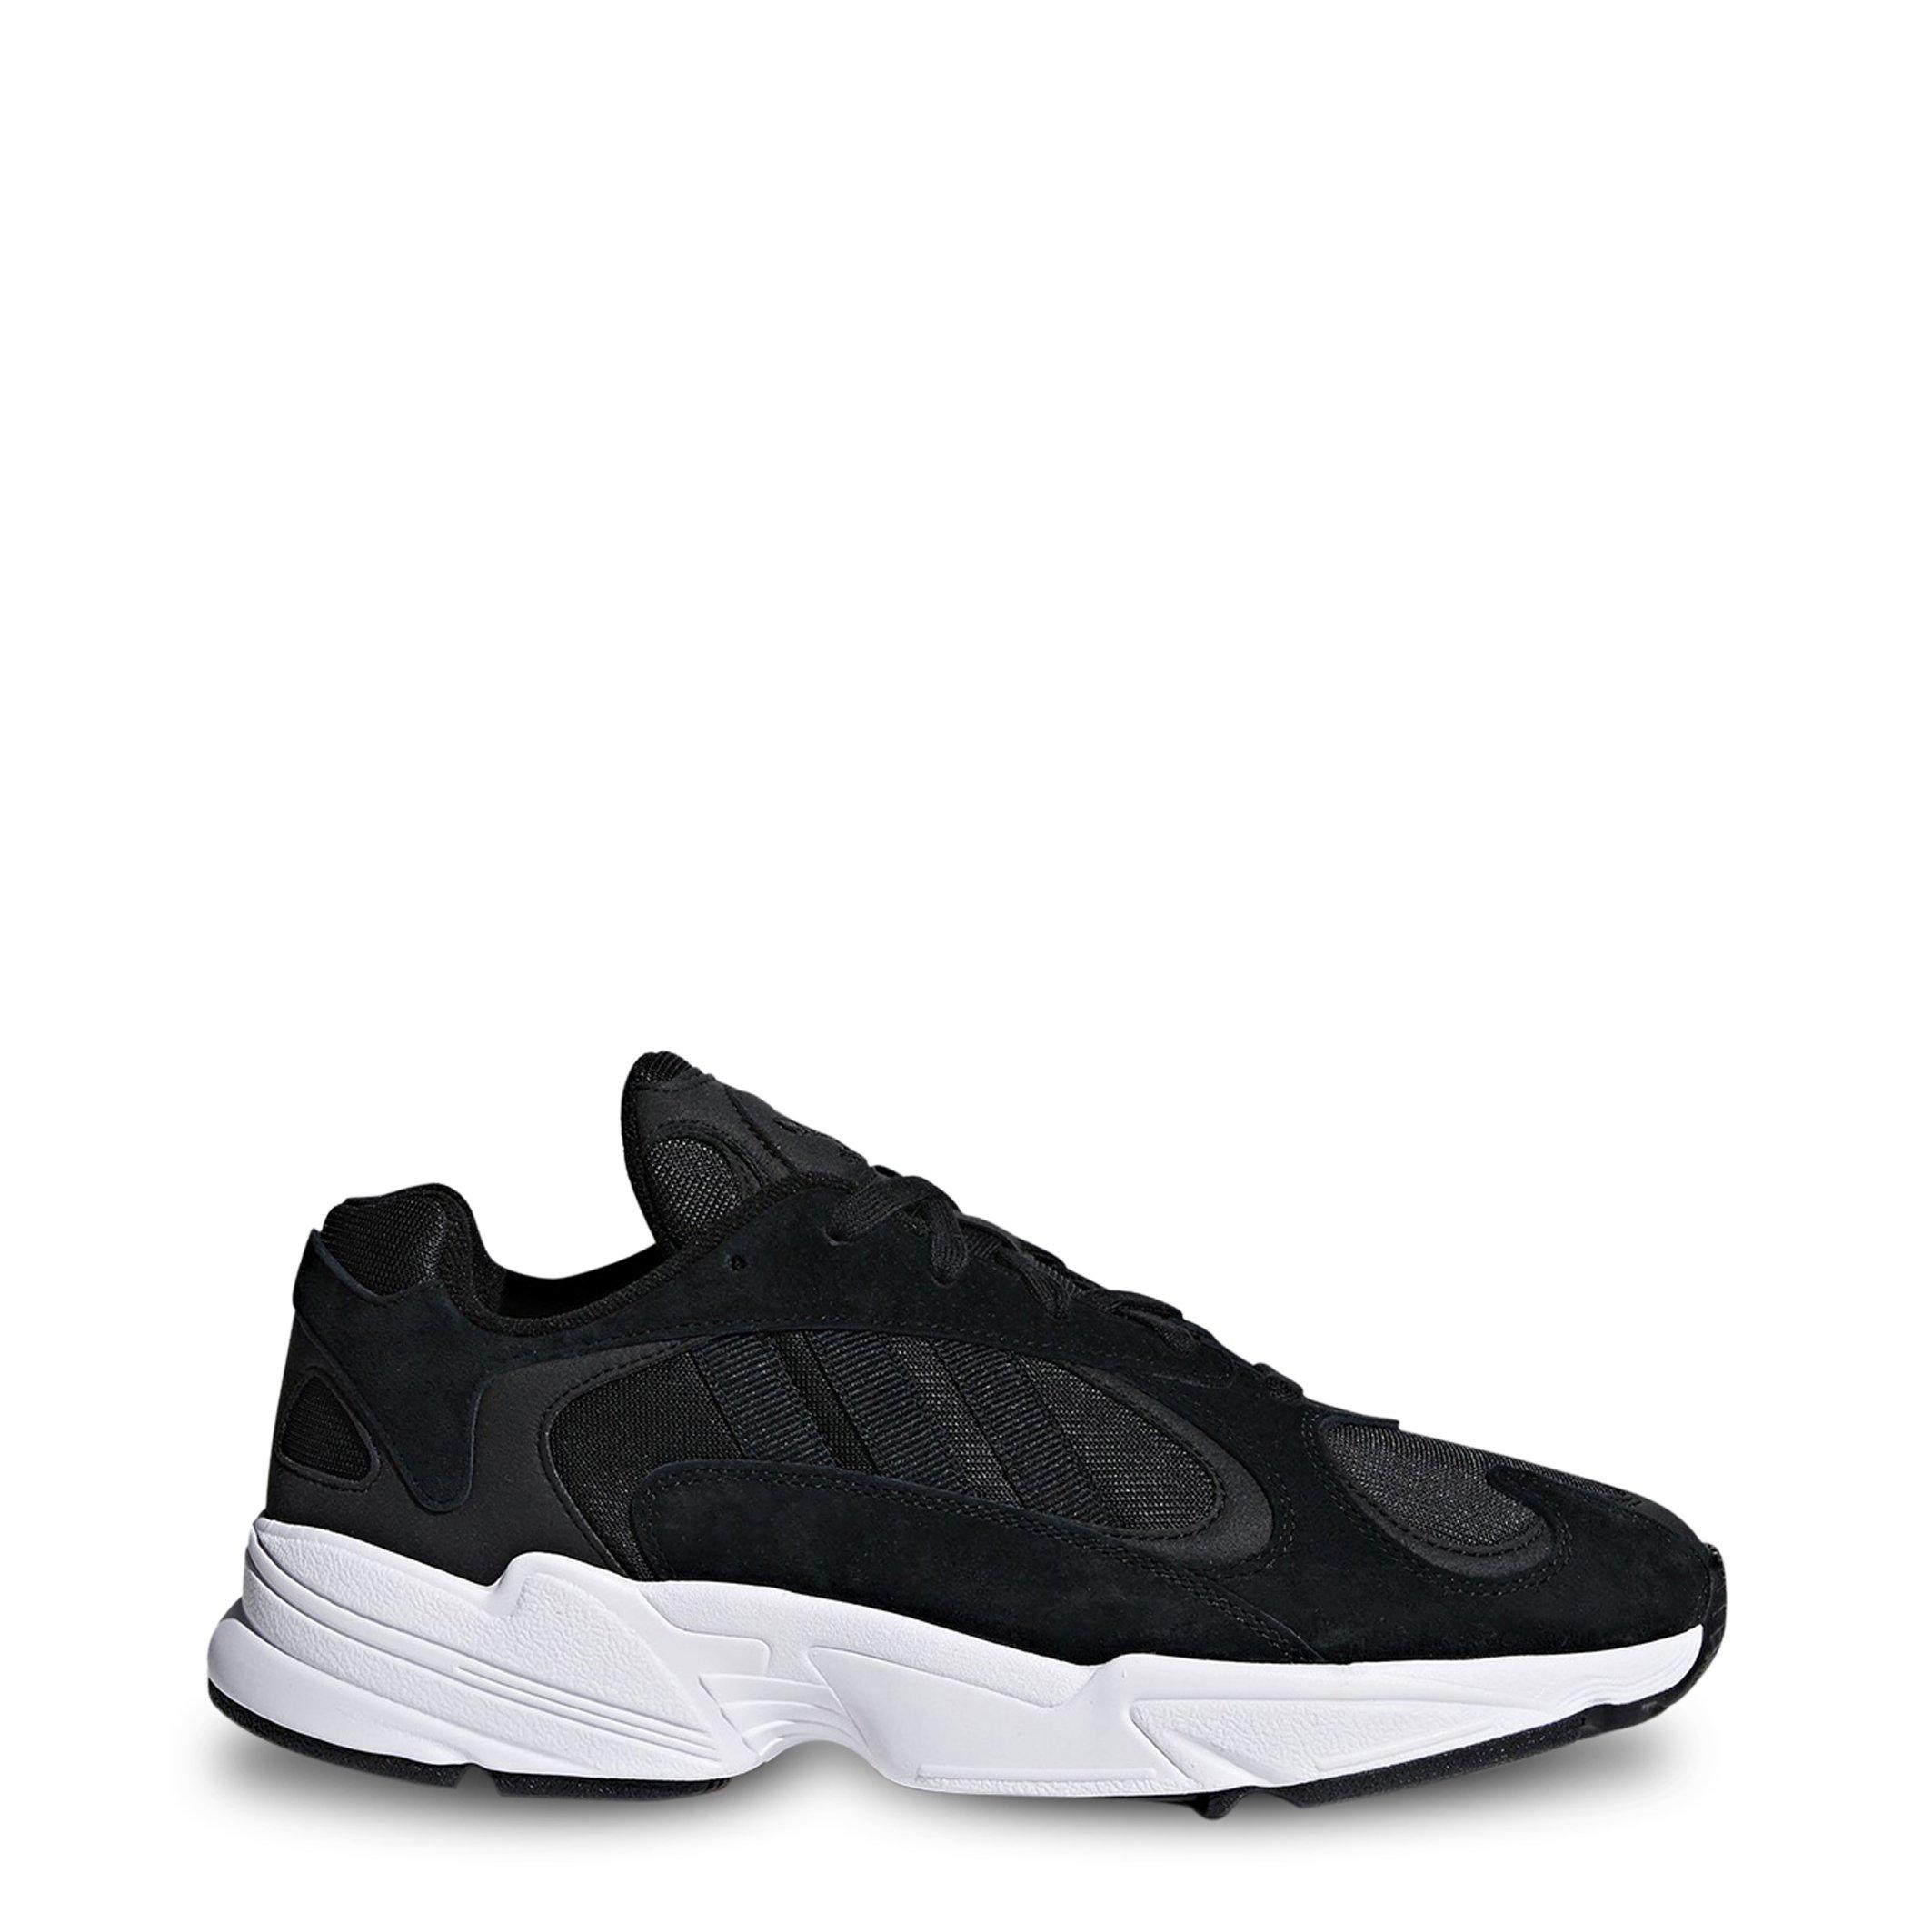 Adidas Unisex Trainers Various Colours BD7654 - black 11.5 UK